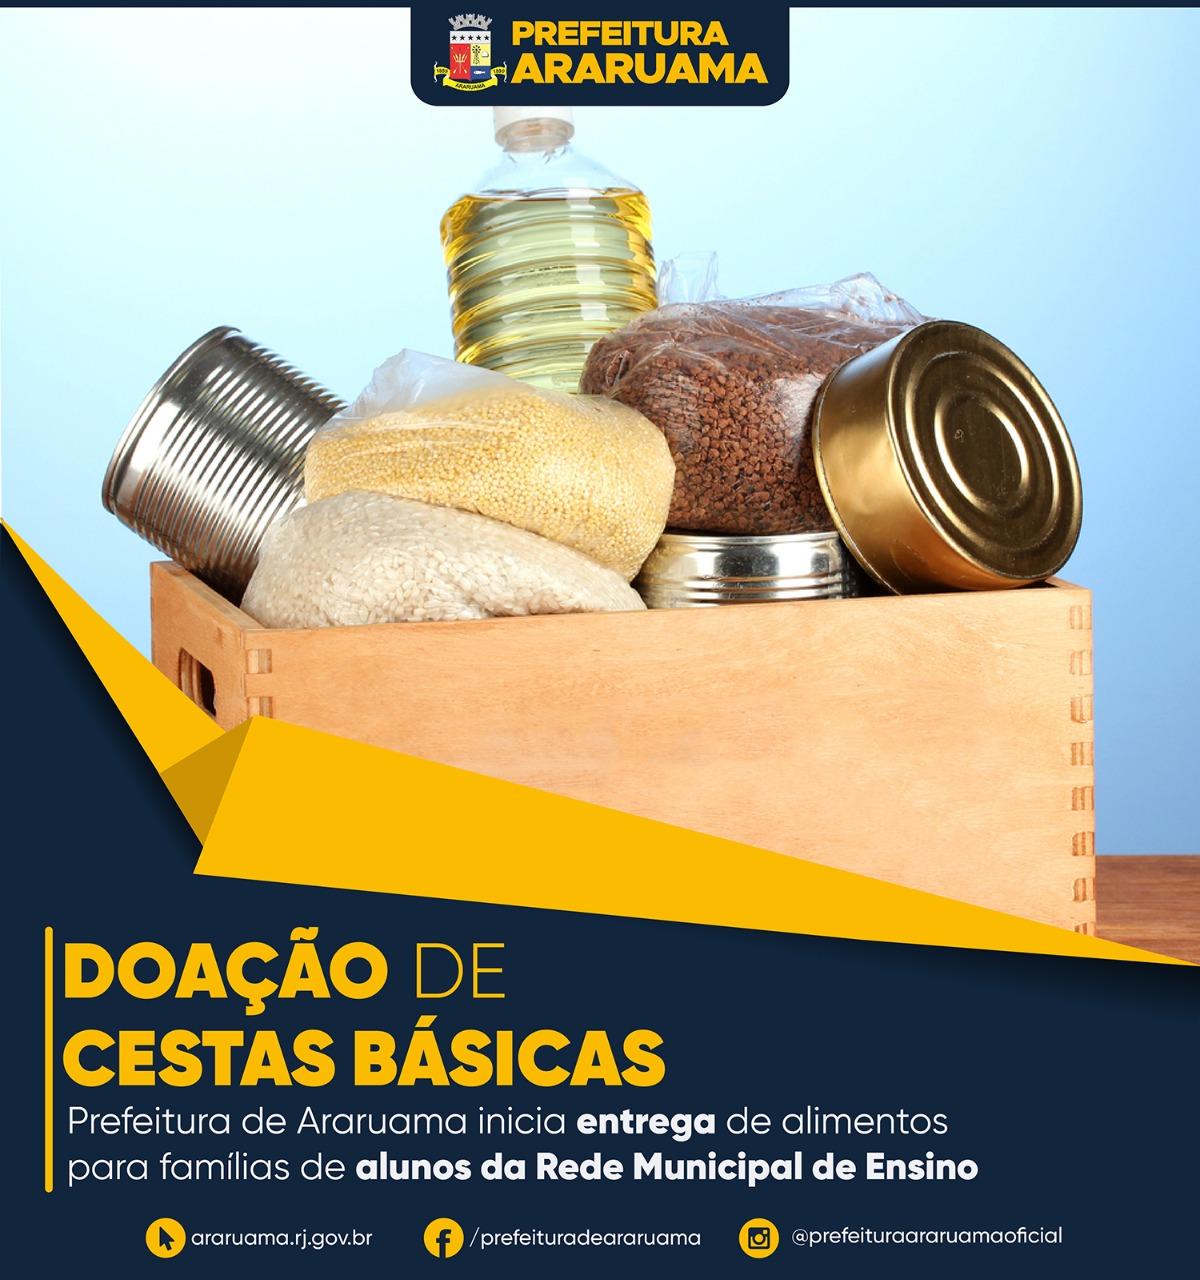 Araruama continua na terça-feira (14) a entrega de cestas básicas para famílias de alunos da rede municipal